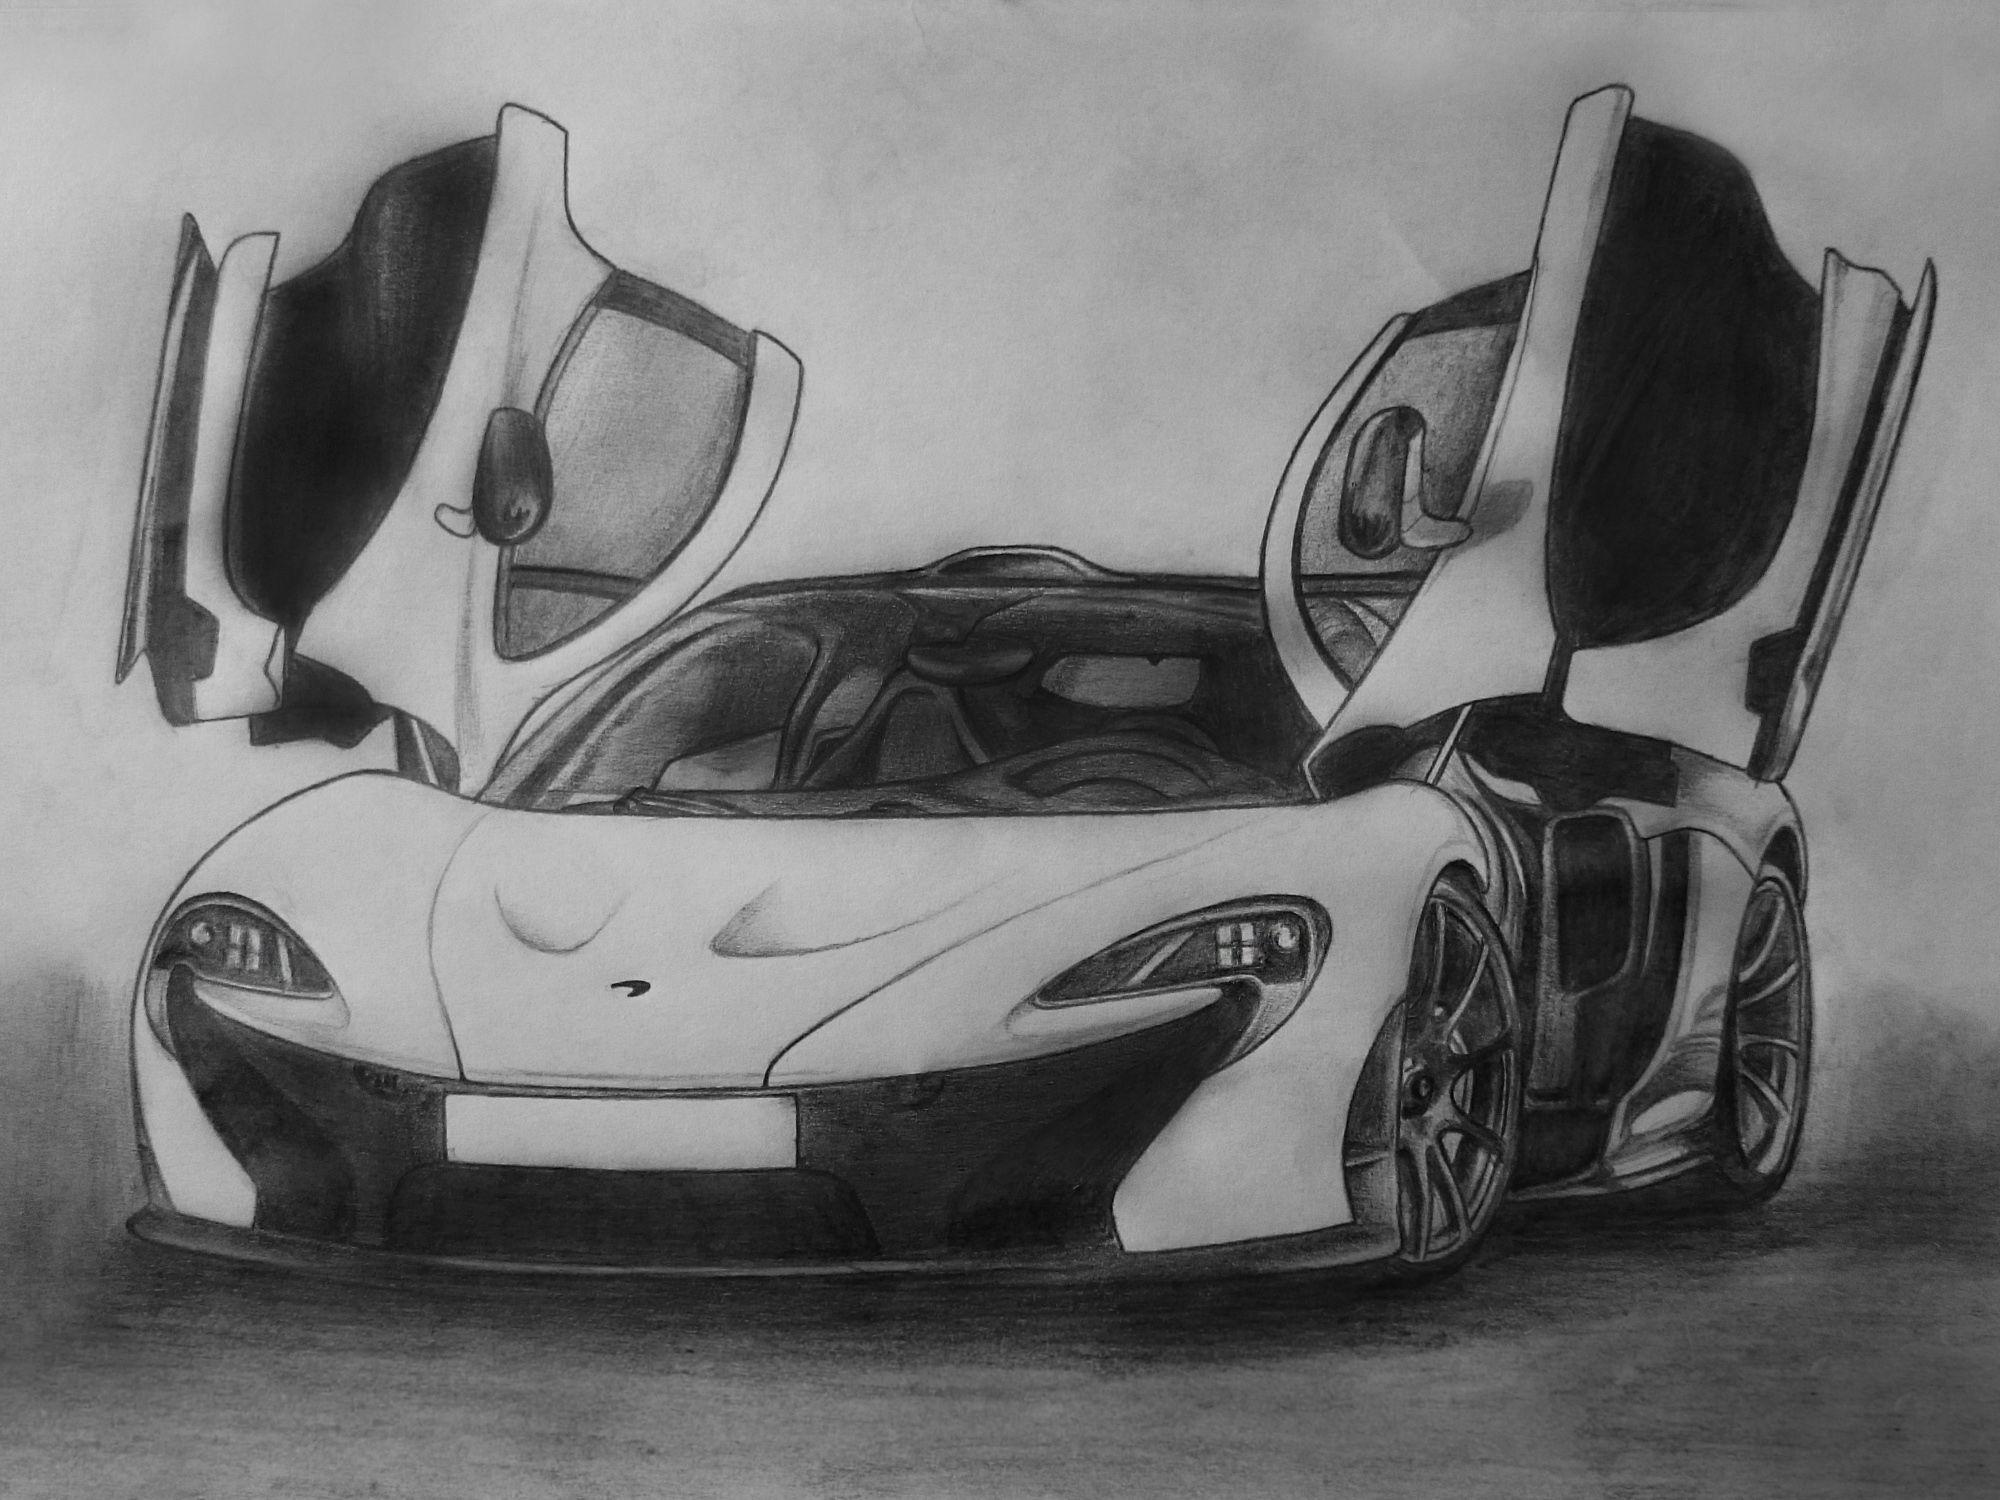 Mclaren P1 Find More Of My Artwork Here Https Www Pinterest Com Hazzoom82 My Artwork Mclaren P1 Mclaren Sports Car